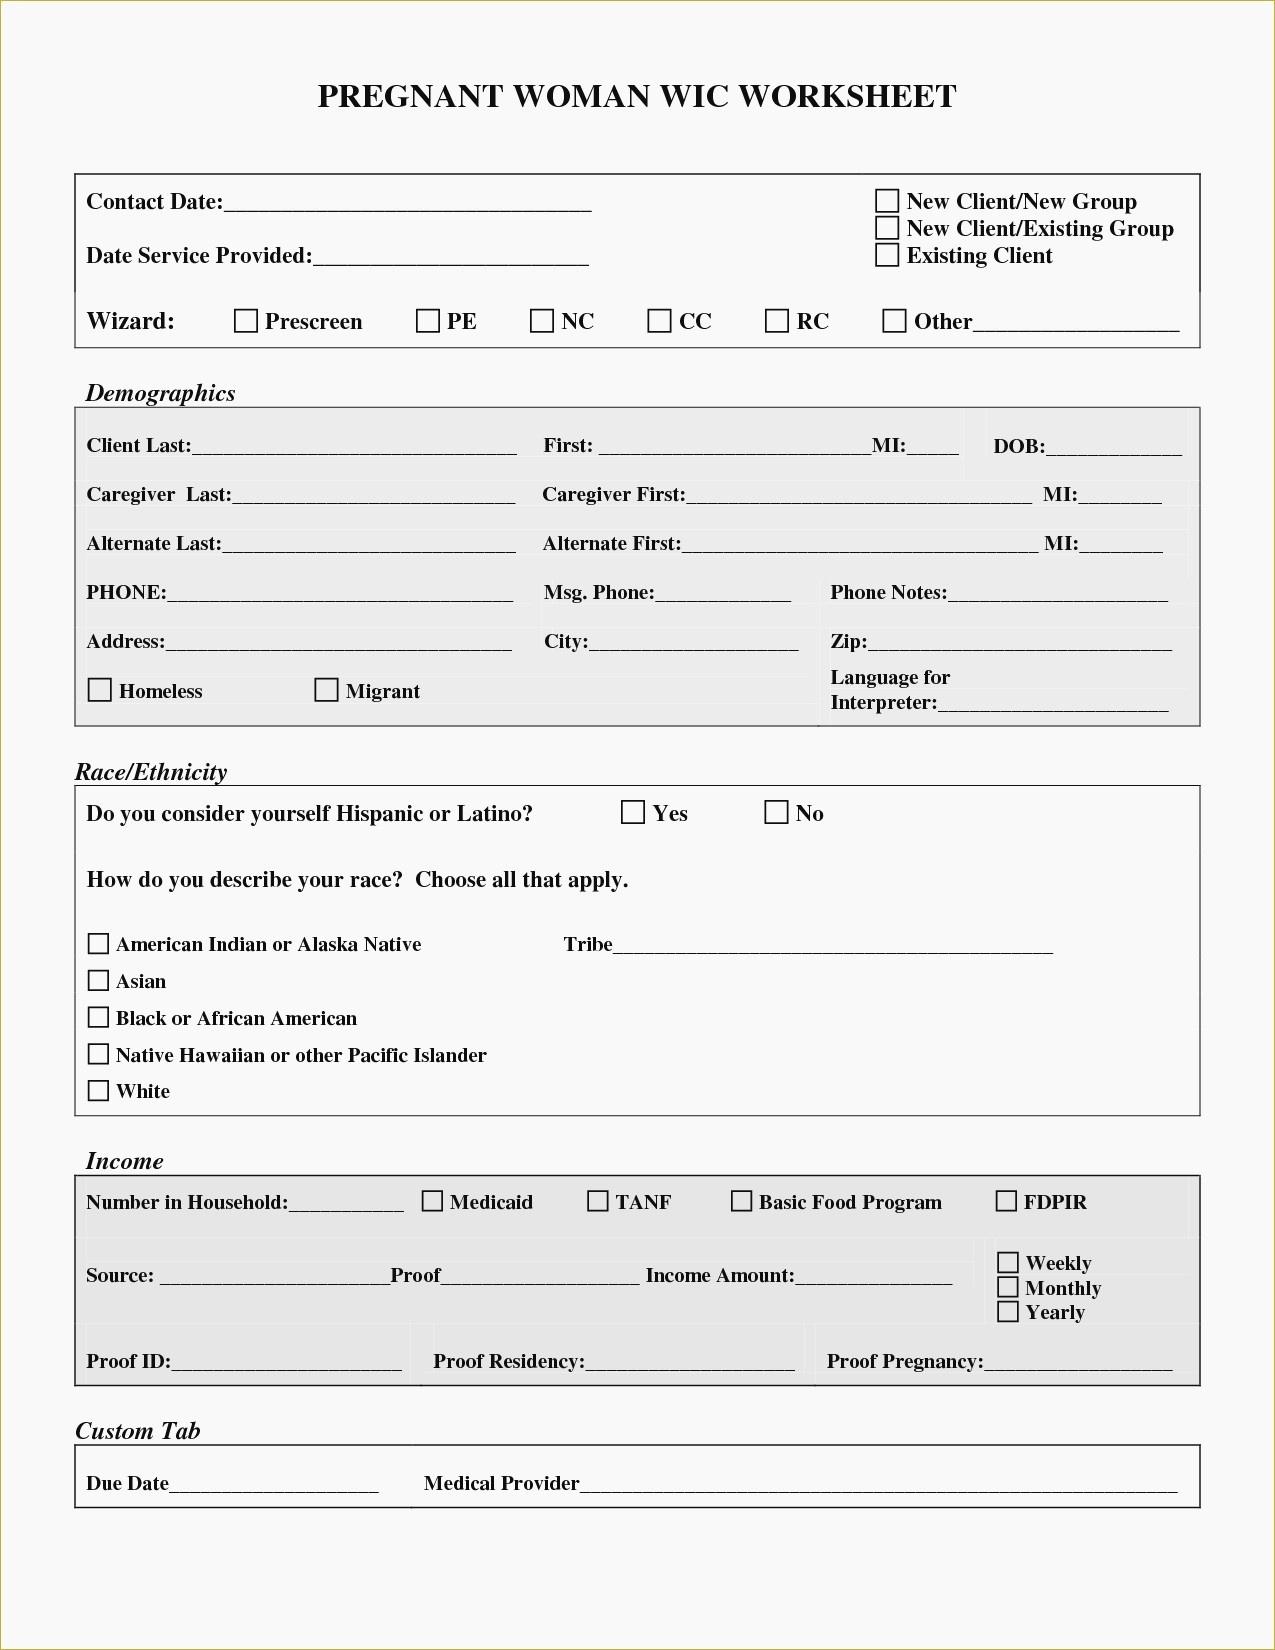 Fake Divorce Papers New Free Printable Fake Pregnancy Papers - Free Printable Fake Pregnancy Papers